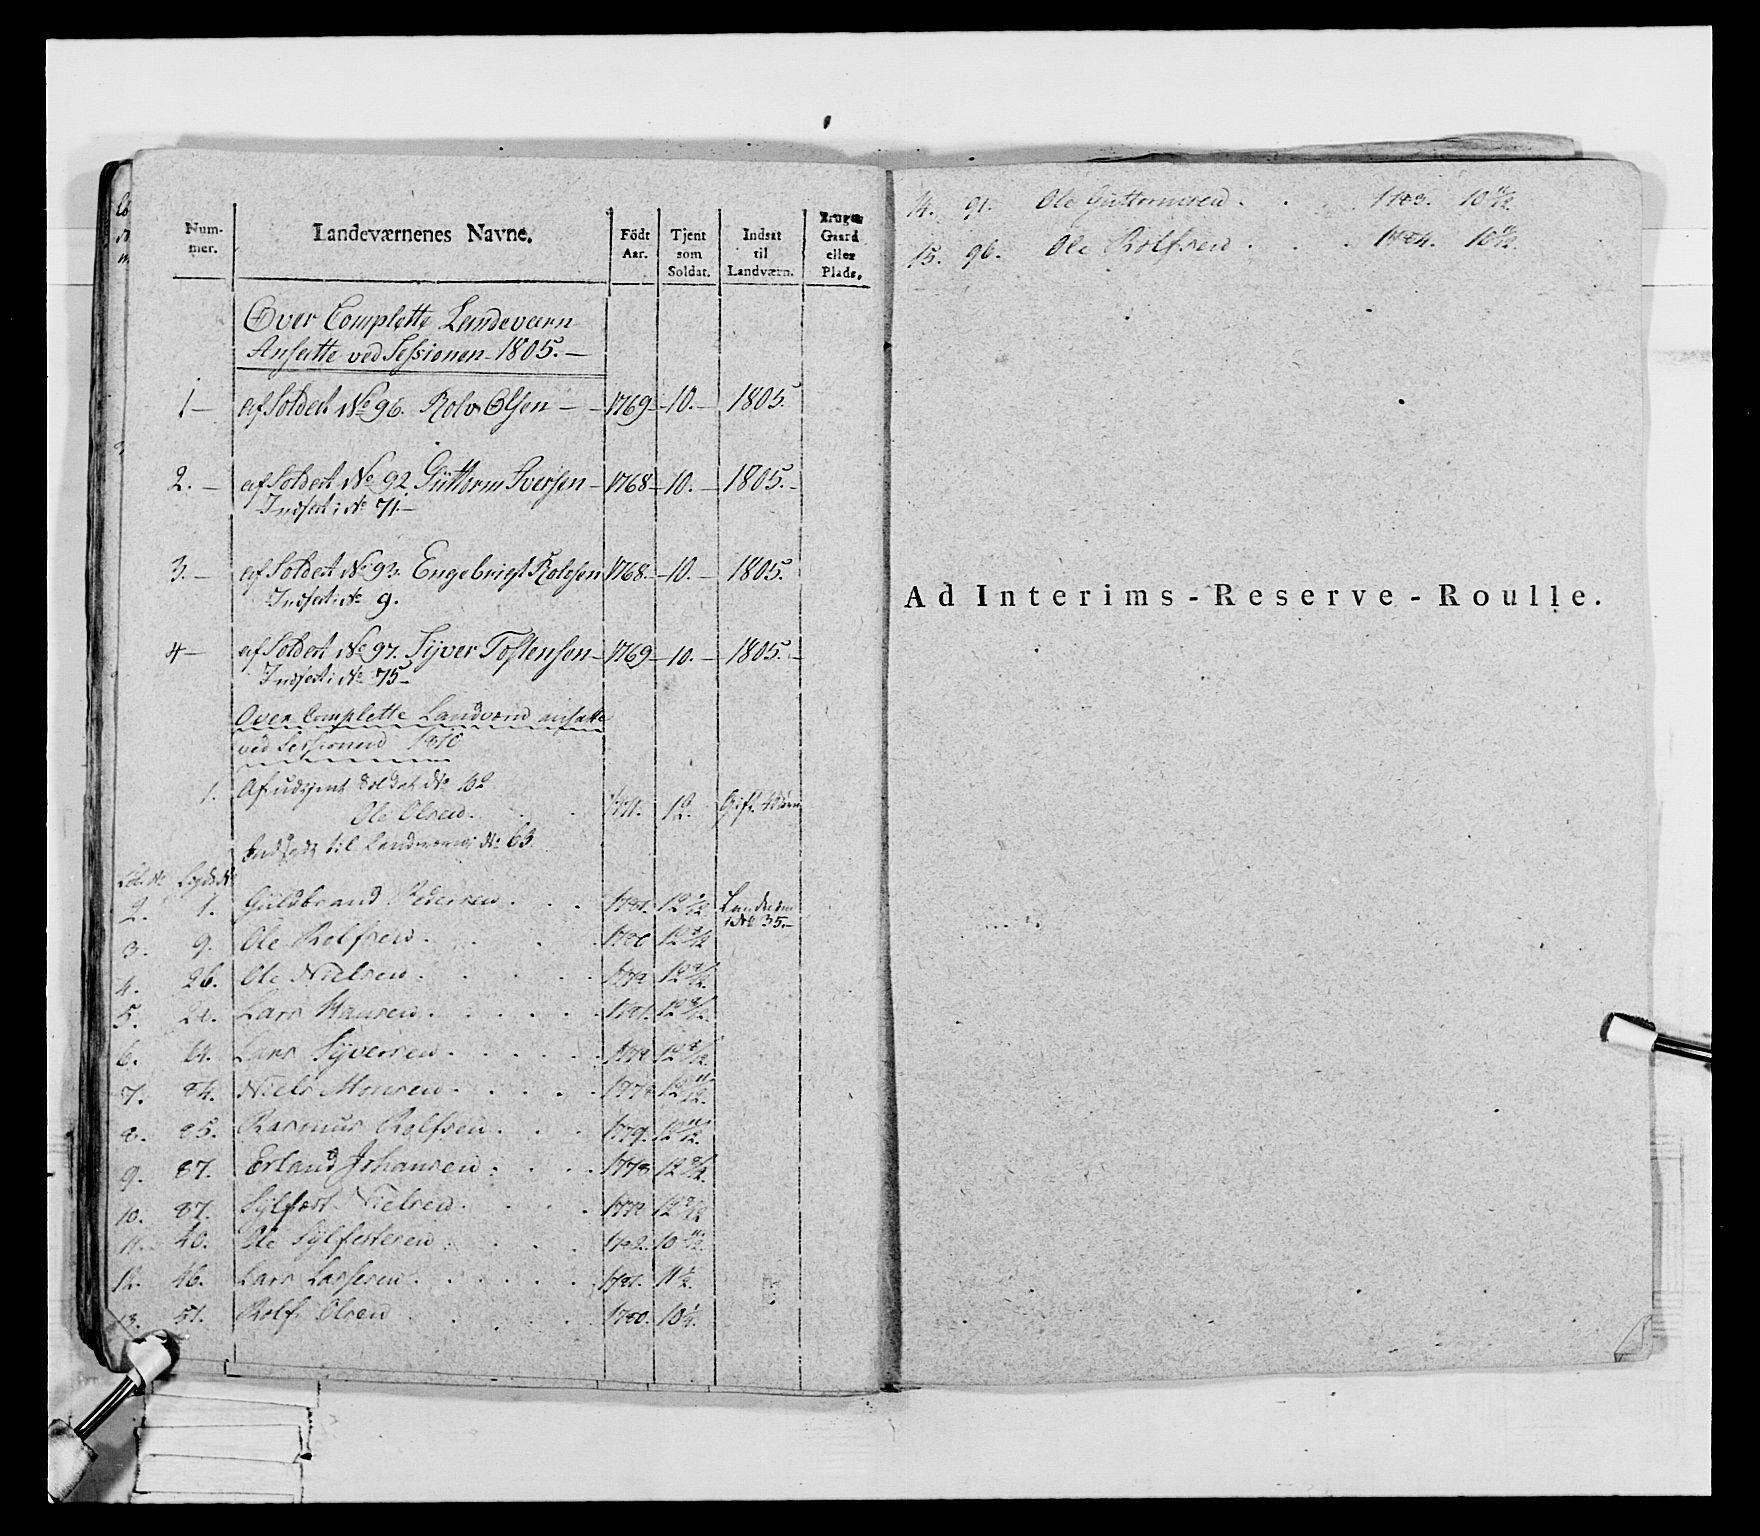 RA, Generalitets- og kommissariatskollegiet, Det kongelige norske kommissariatskollegium, E/Eh/L0069: Opplandske gevorbne infanteriregiment, 1810-1818, s. 197